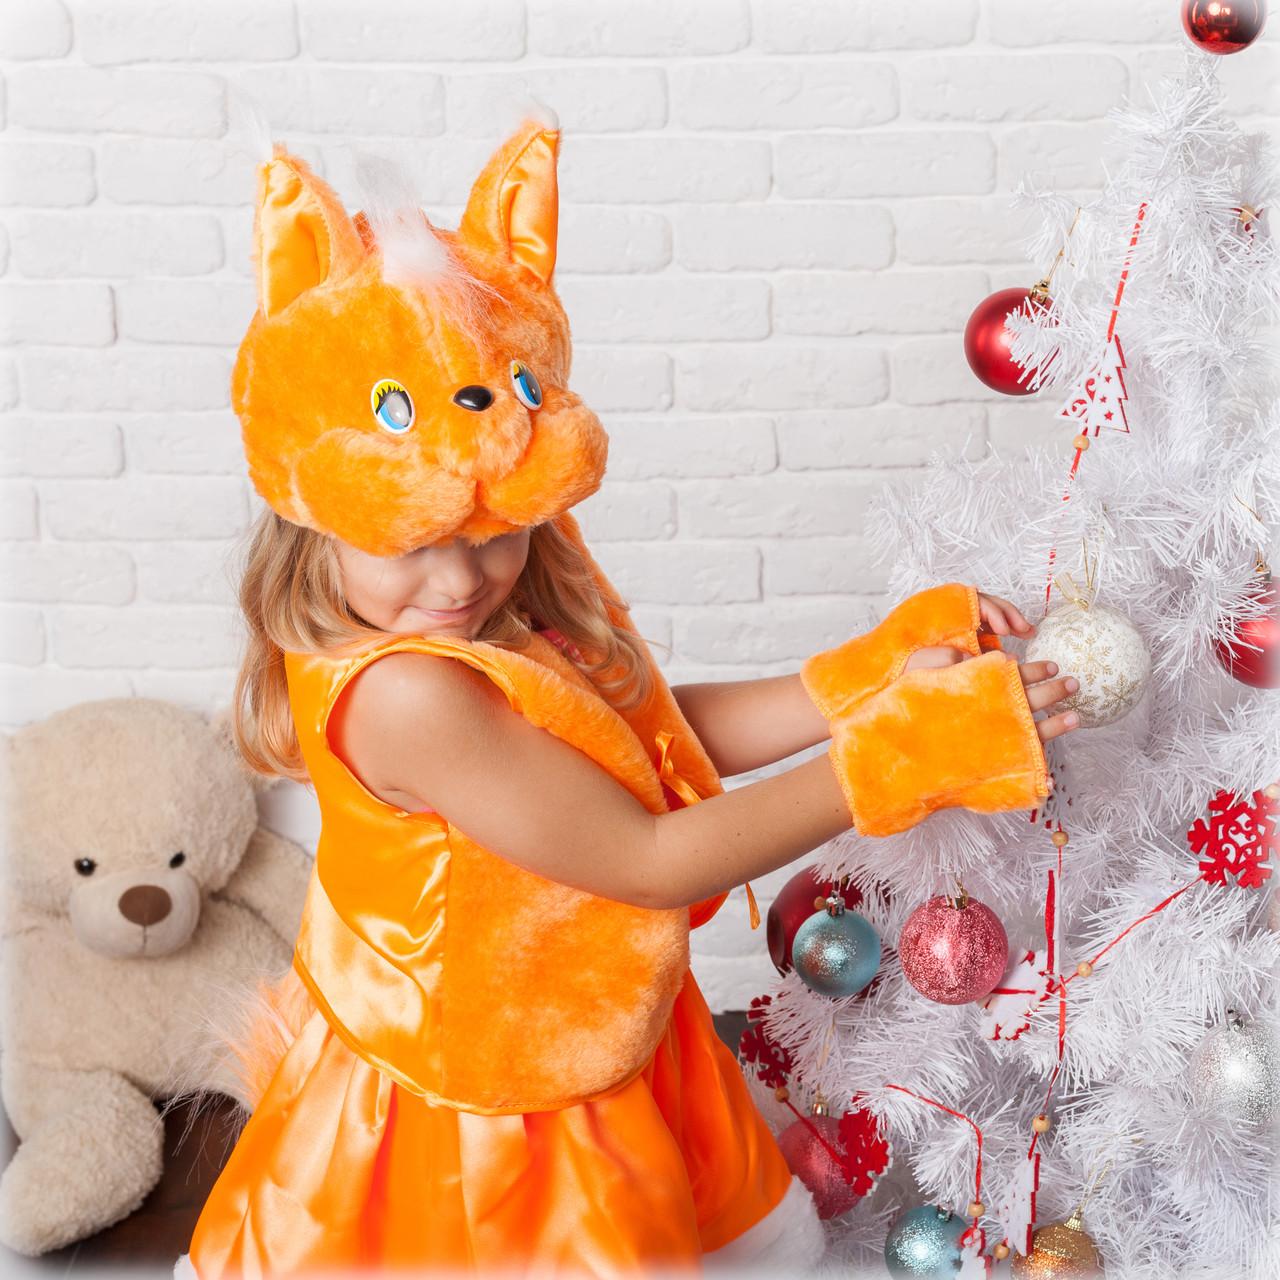 Детский новогодний костюм для девочки белочки